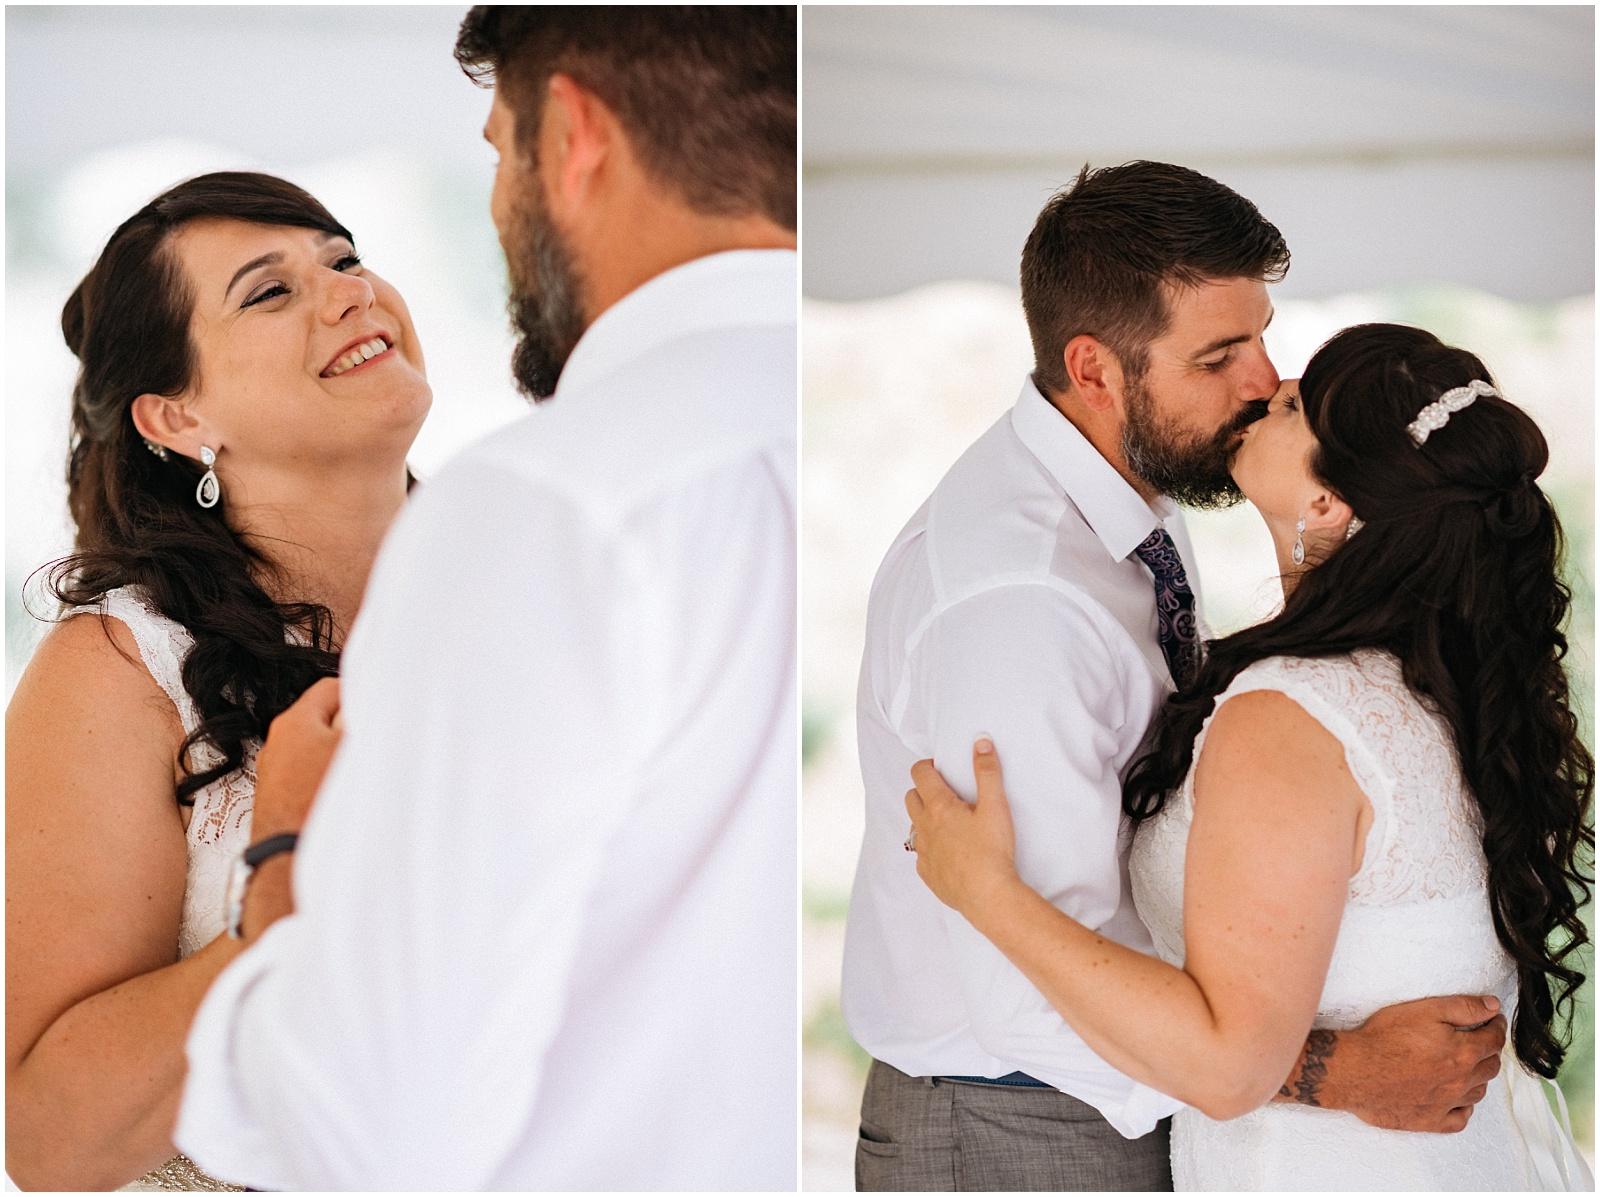 Top wedding photojournalist